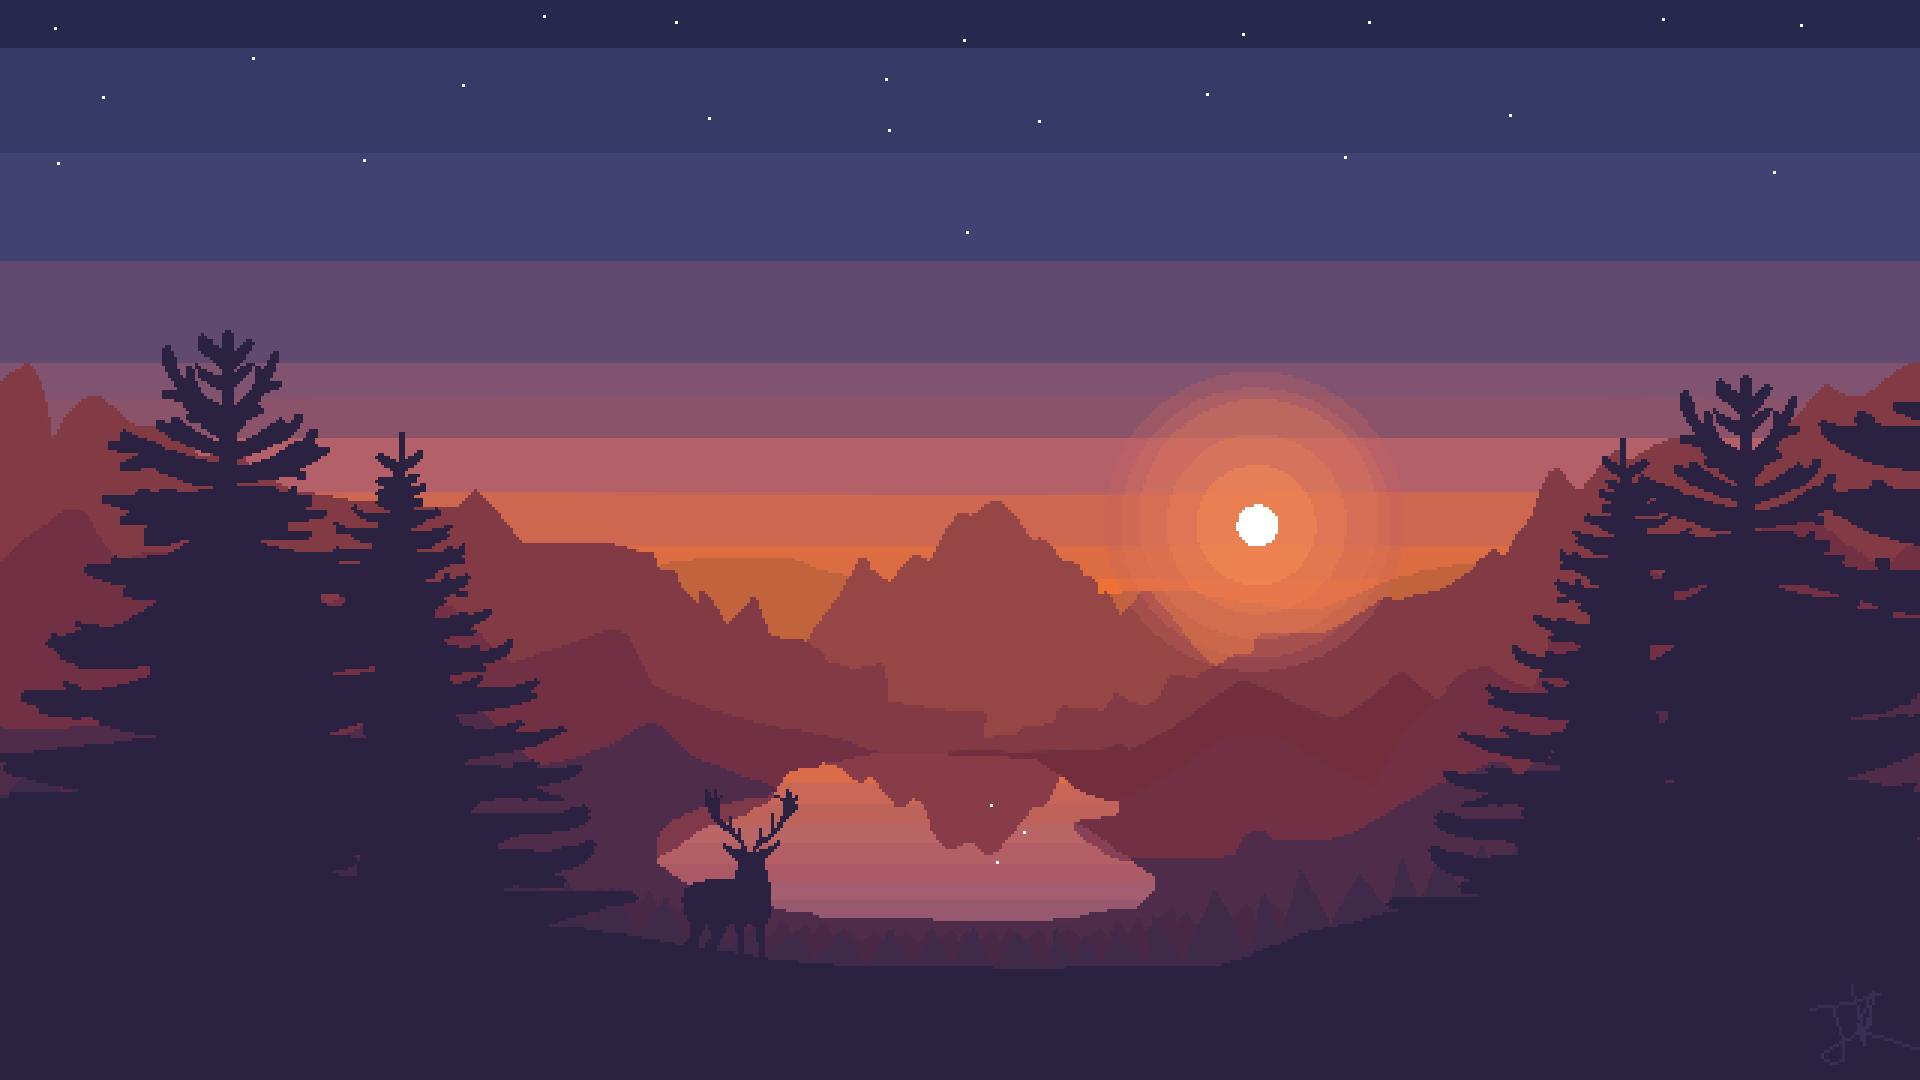 Related Image Landscape Wallpaper Sunset Wallpaper Pixel Art